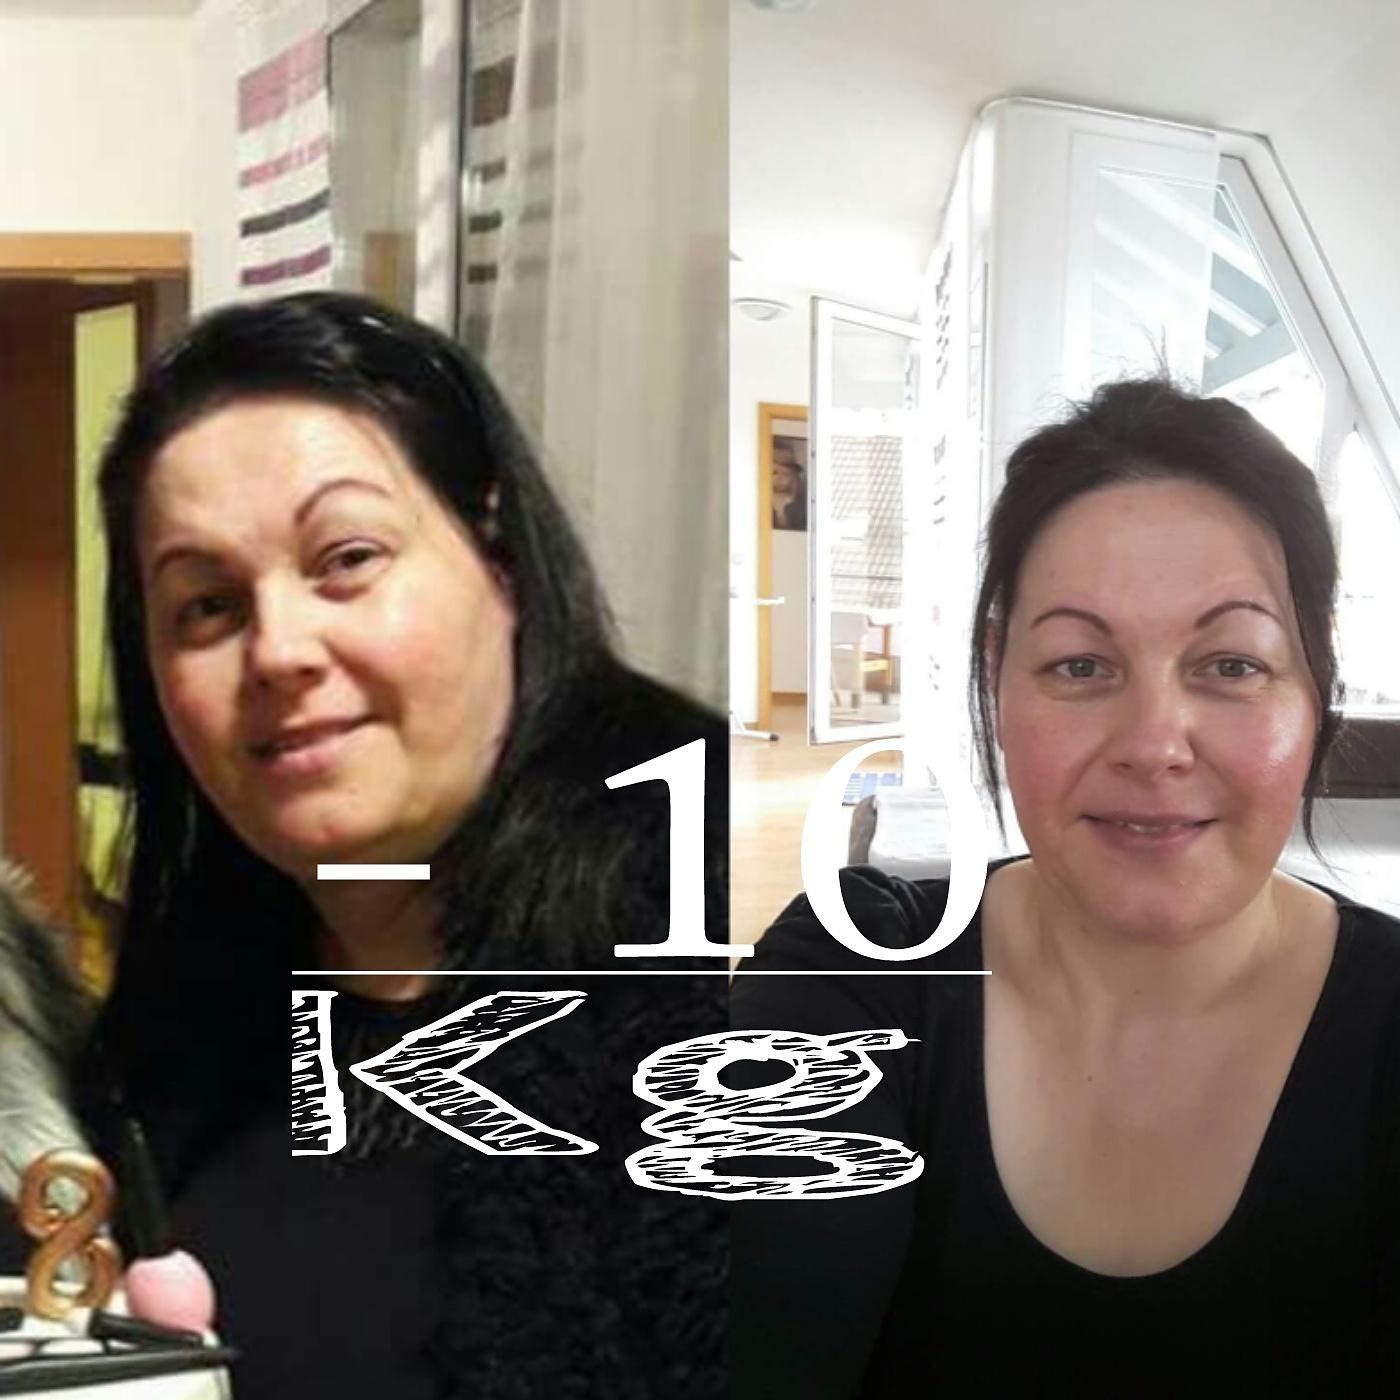 Dieta Janina Romania | سلطنة عمان onlyus.ro